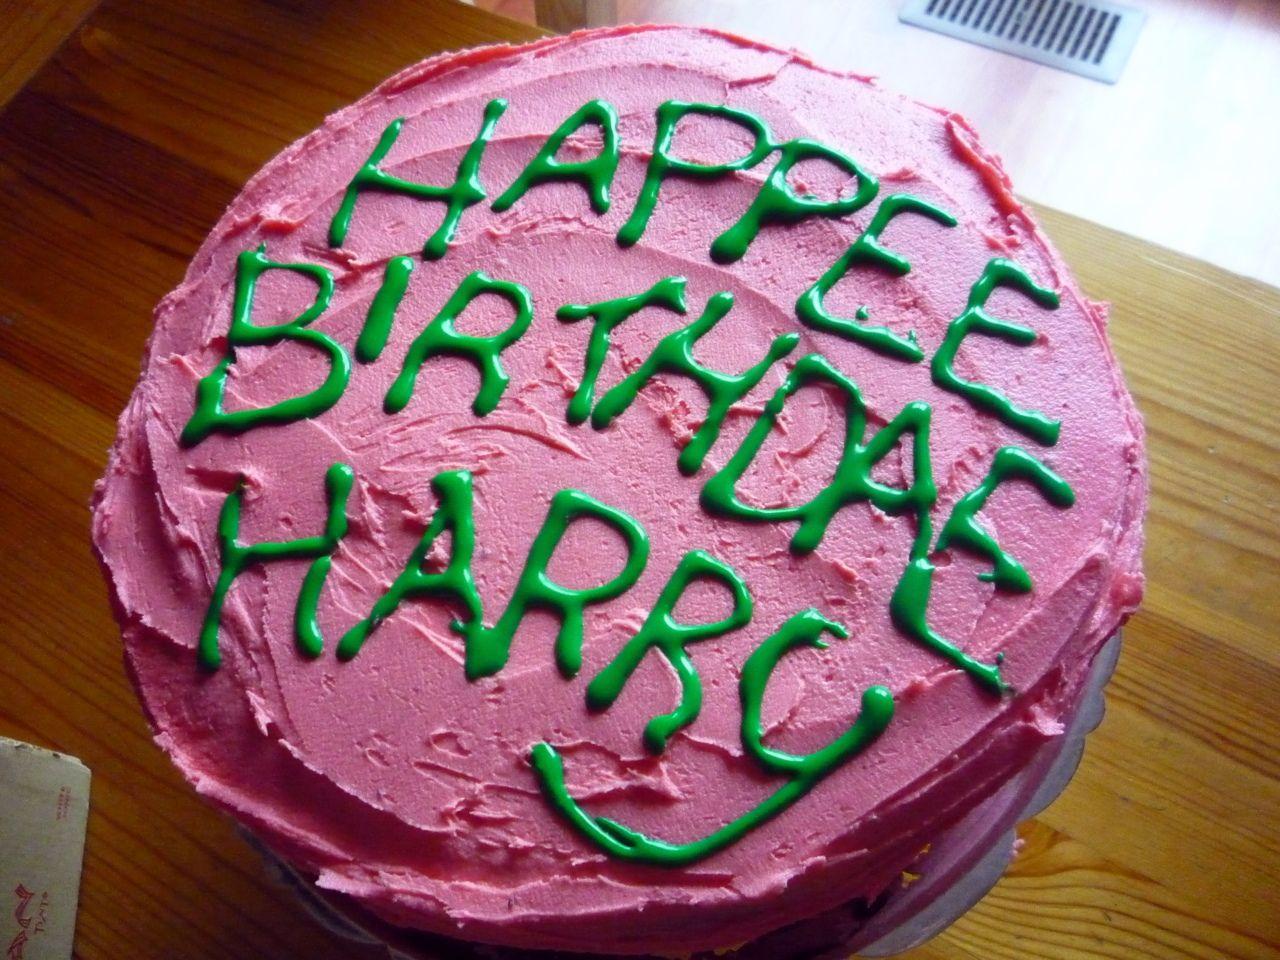 Harry Potter Inspired Hagrids Birthday Cake Harry Potter Inspired